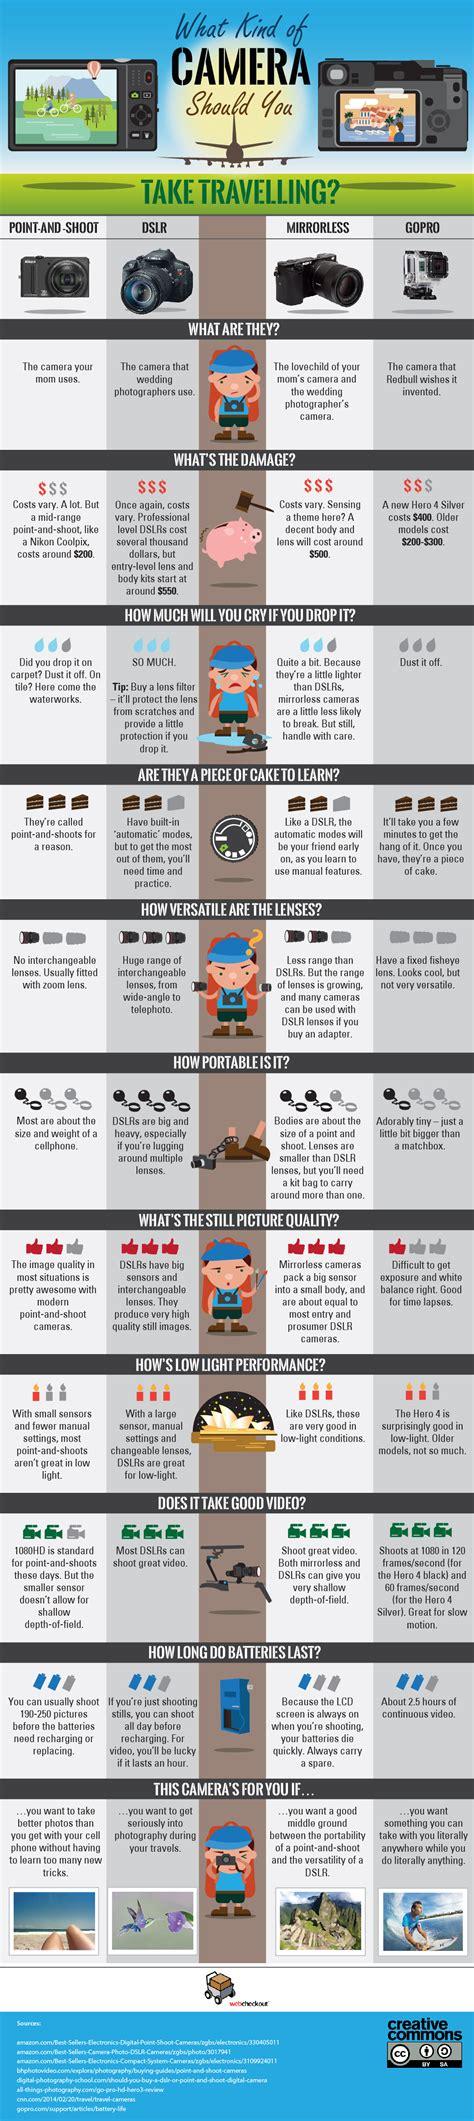 pubg cheat sheet 60 infographics cheat sheets every photographer needs